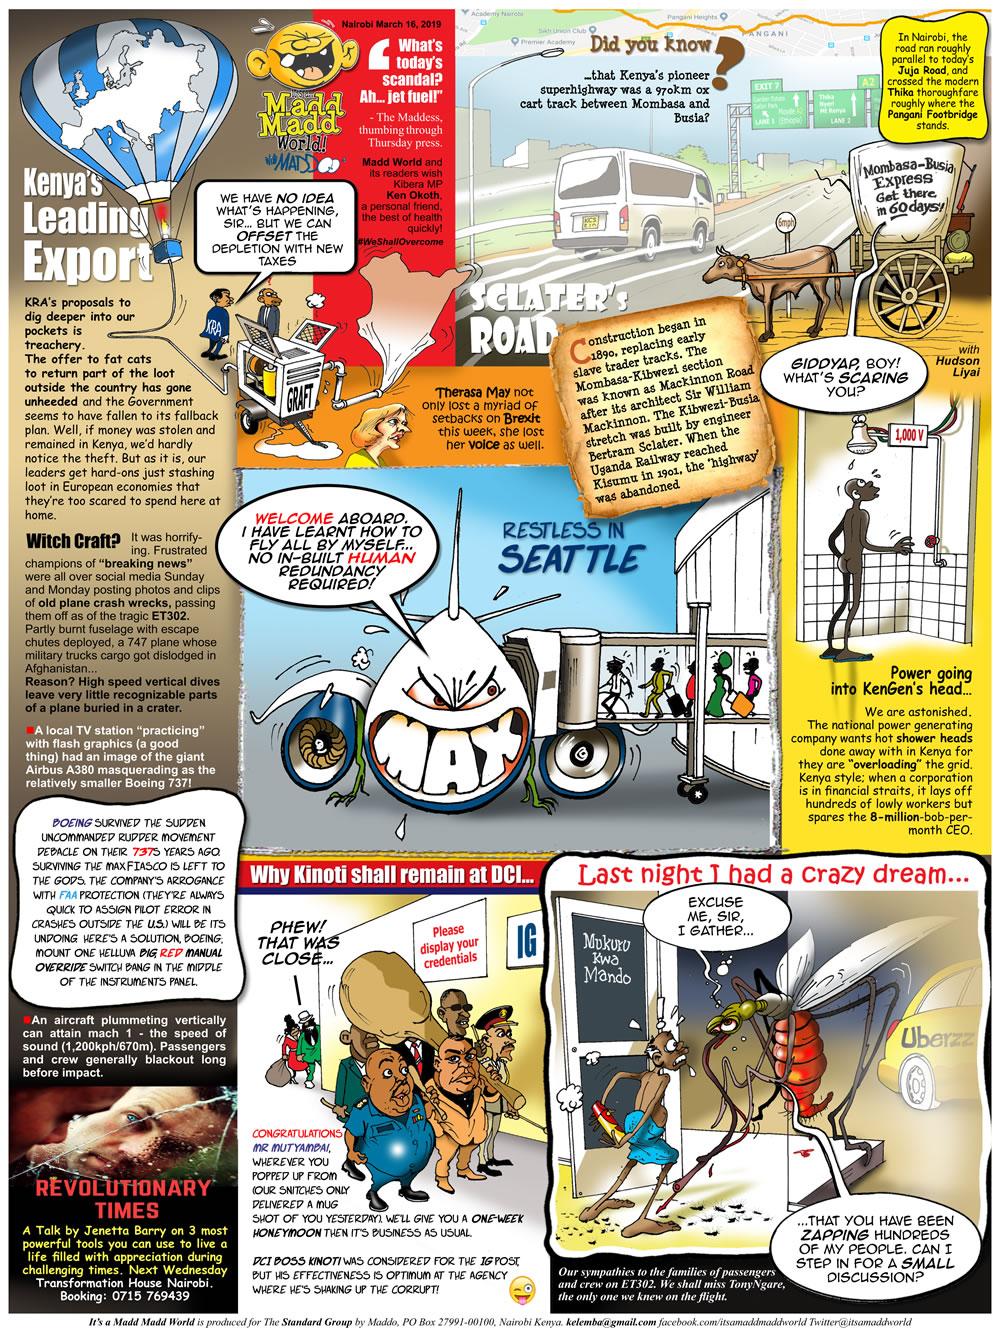 Kenya's Leading Exports!